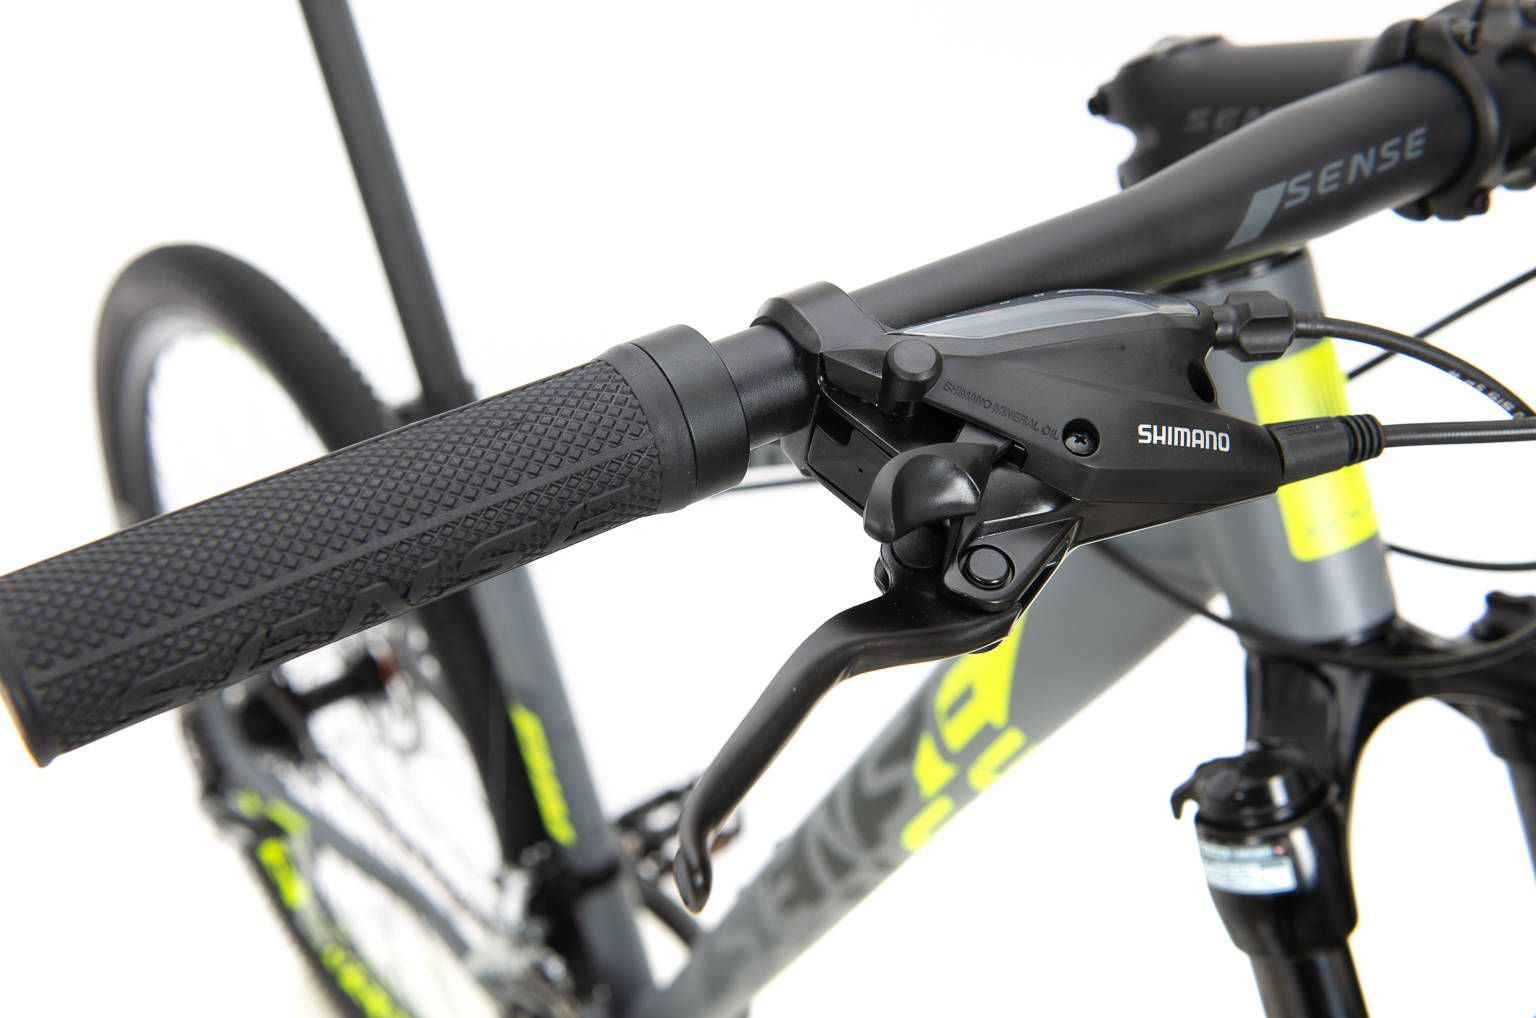 Bicicleta SENSE Fun 2020 - 24v Shimano Acera - Cinza/Amarelo